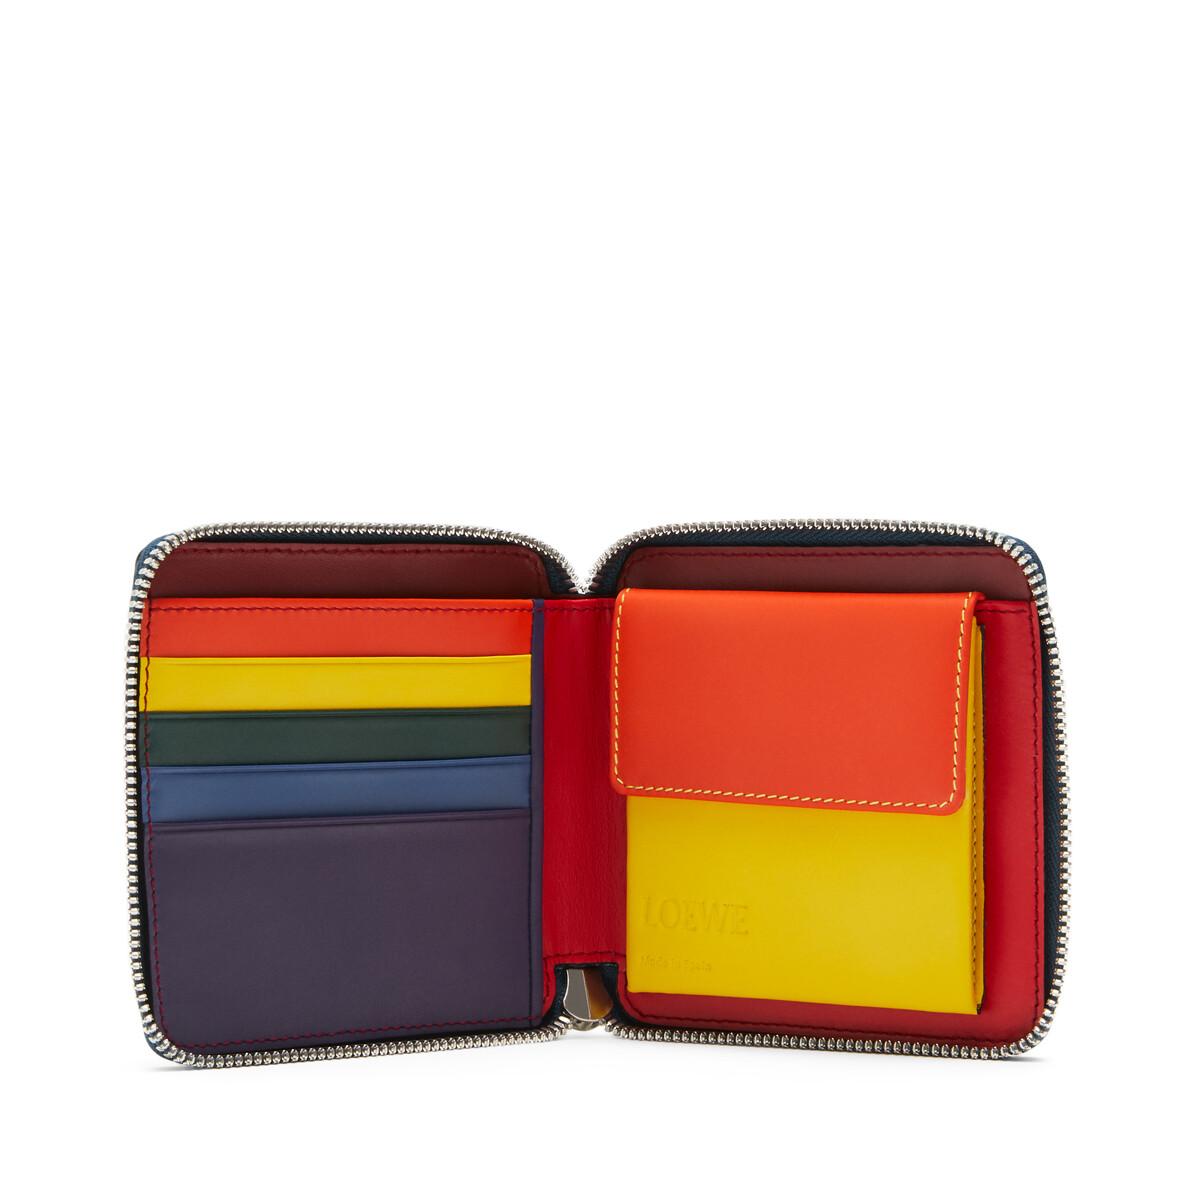 LOEWE Rainbow Square Zip Wallet blue/multicolour front